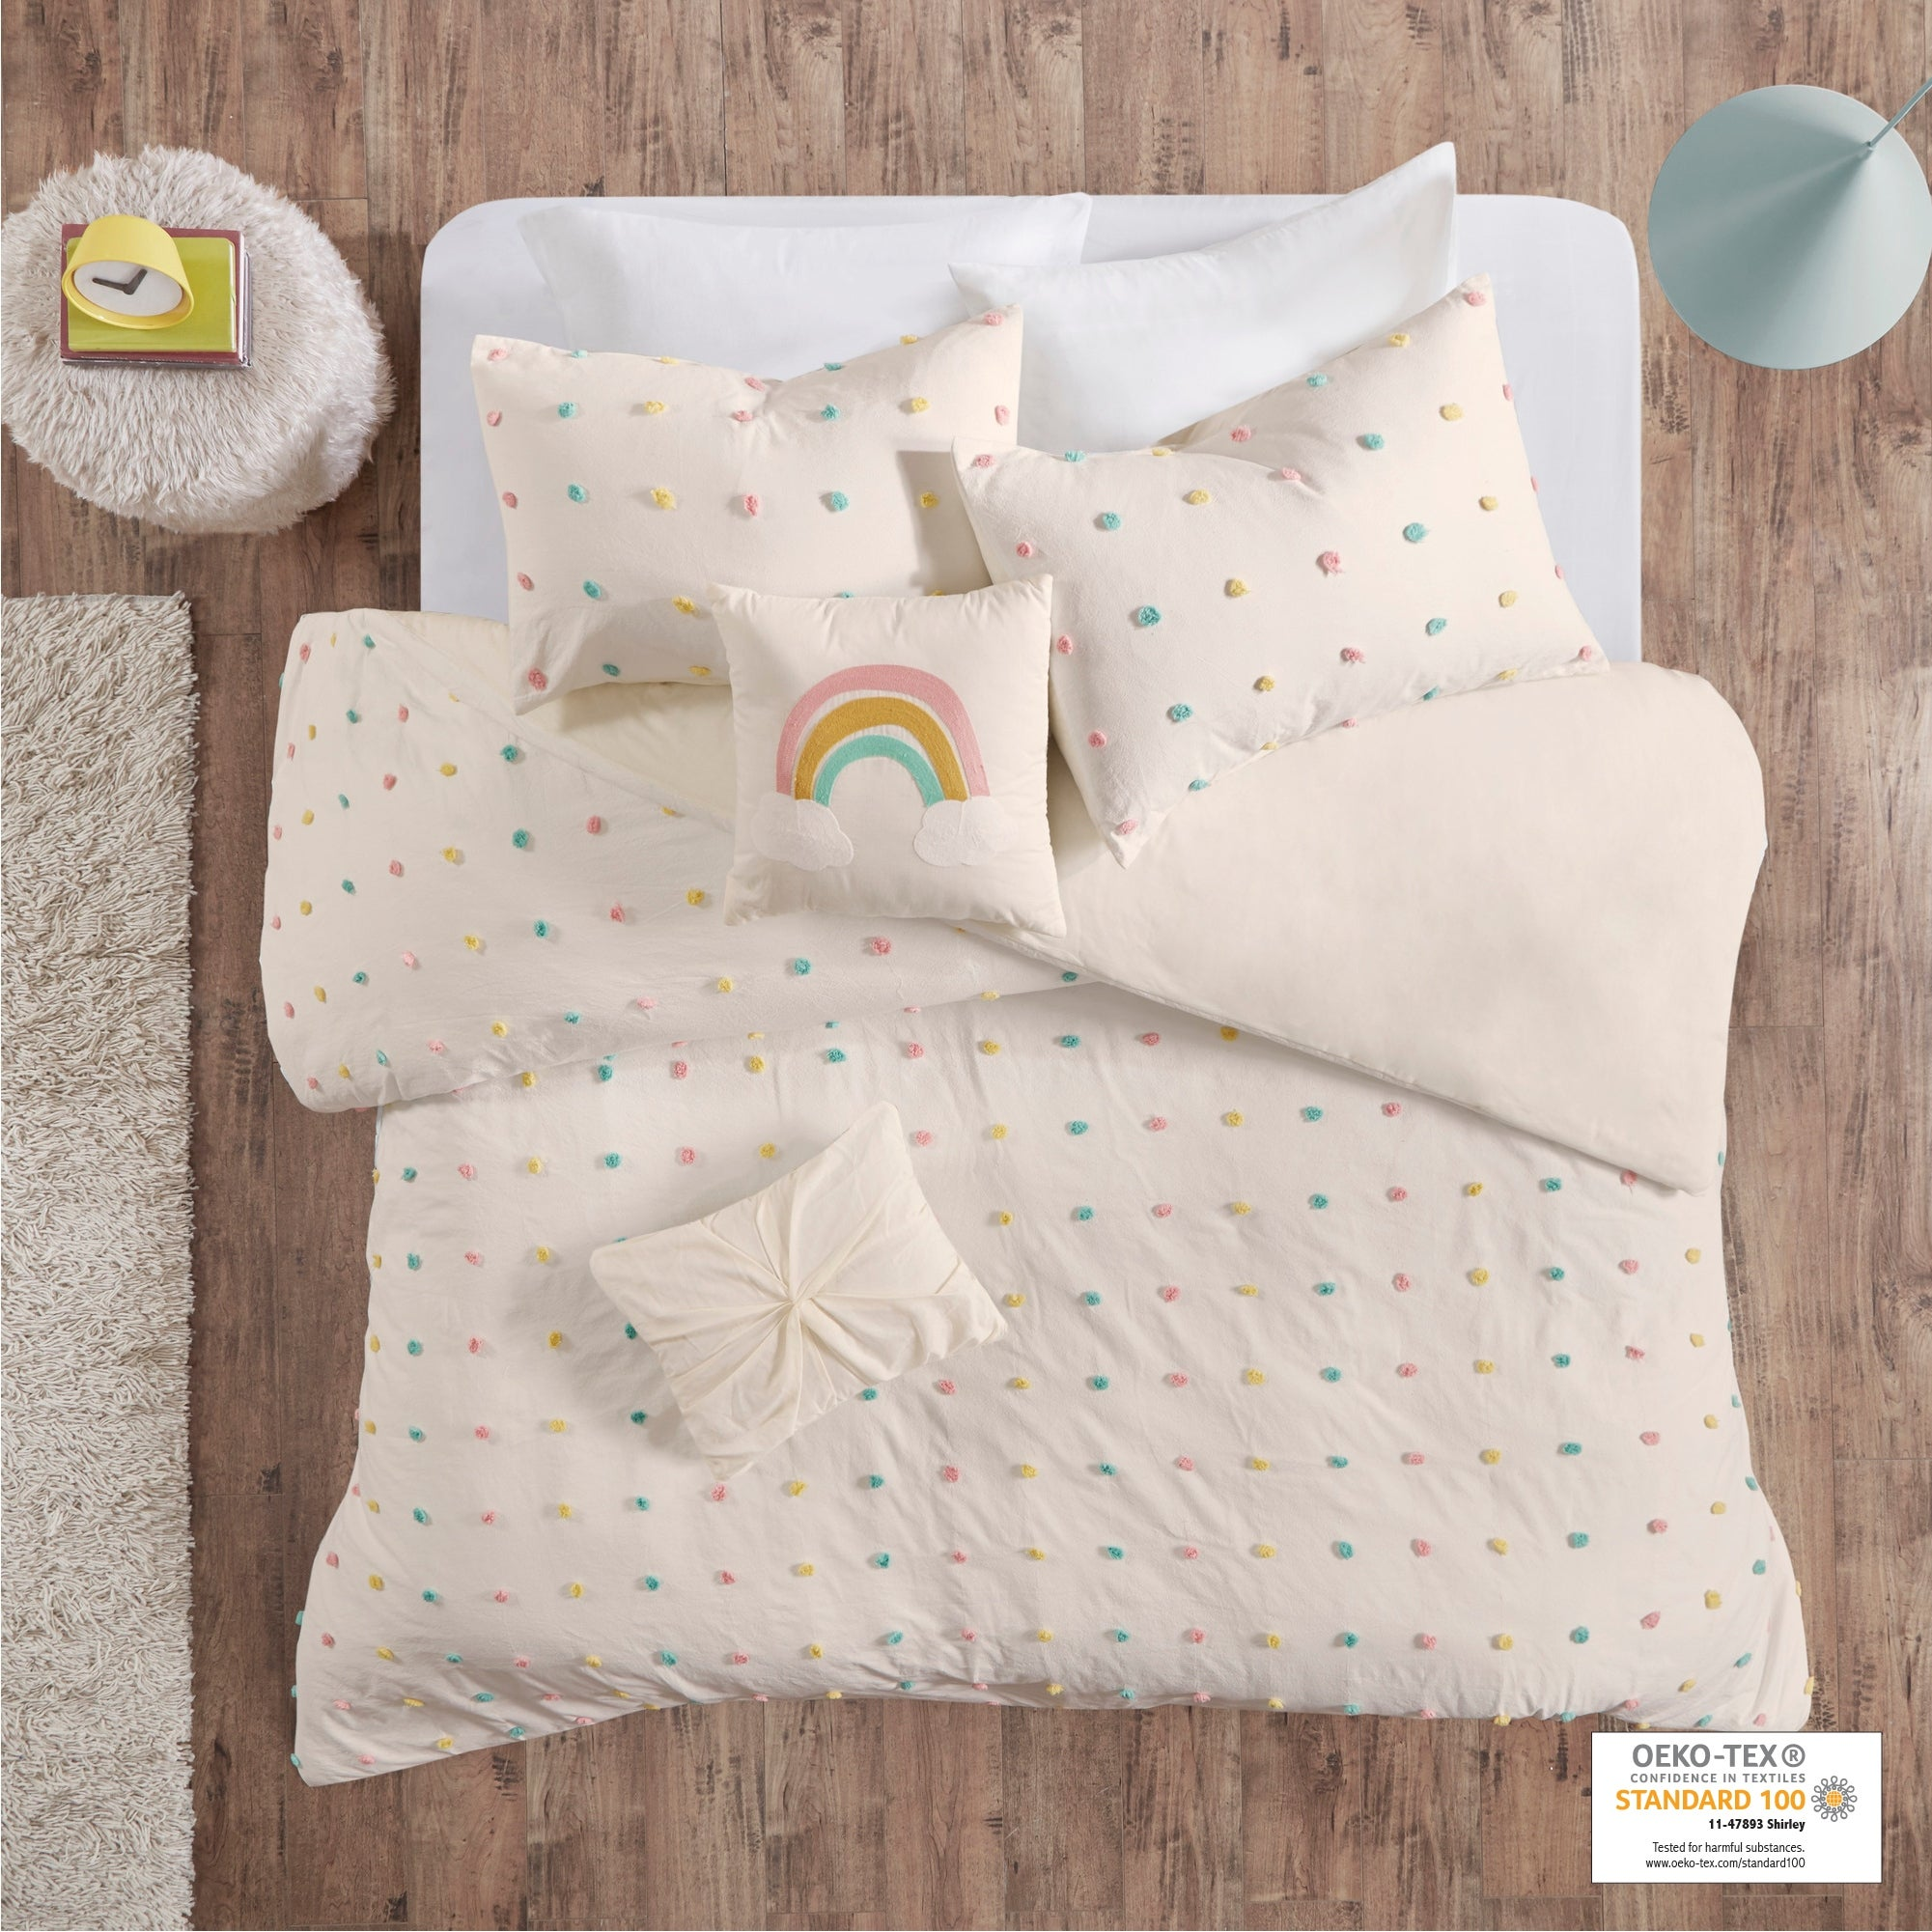 Urban Habitat Kids Ensley Cotton Jacquard Pom Pom Duvet Cover Set Overstock 30566681